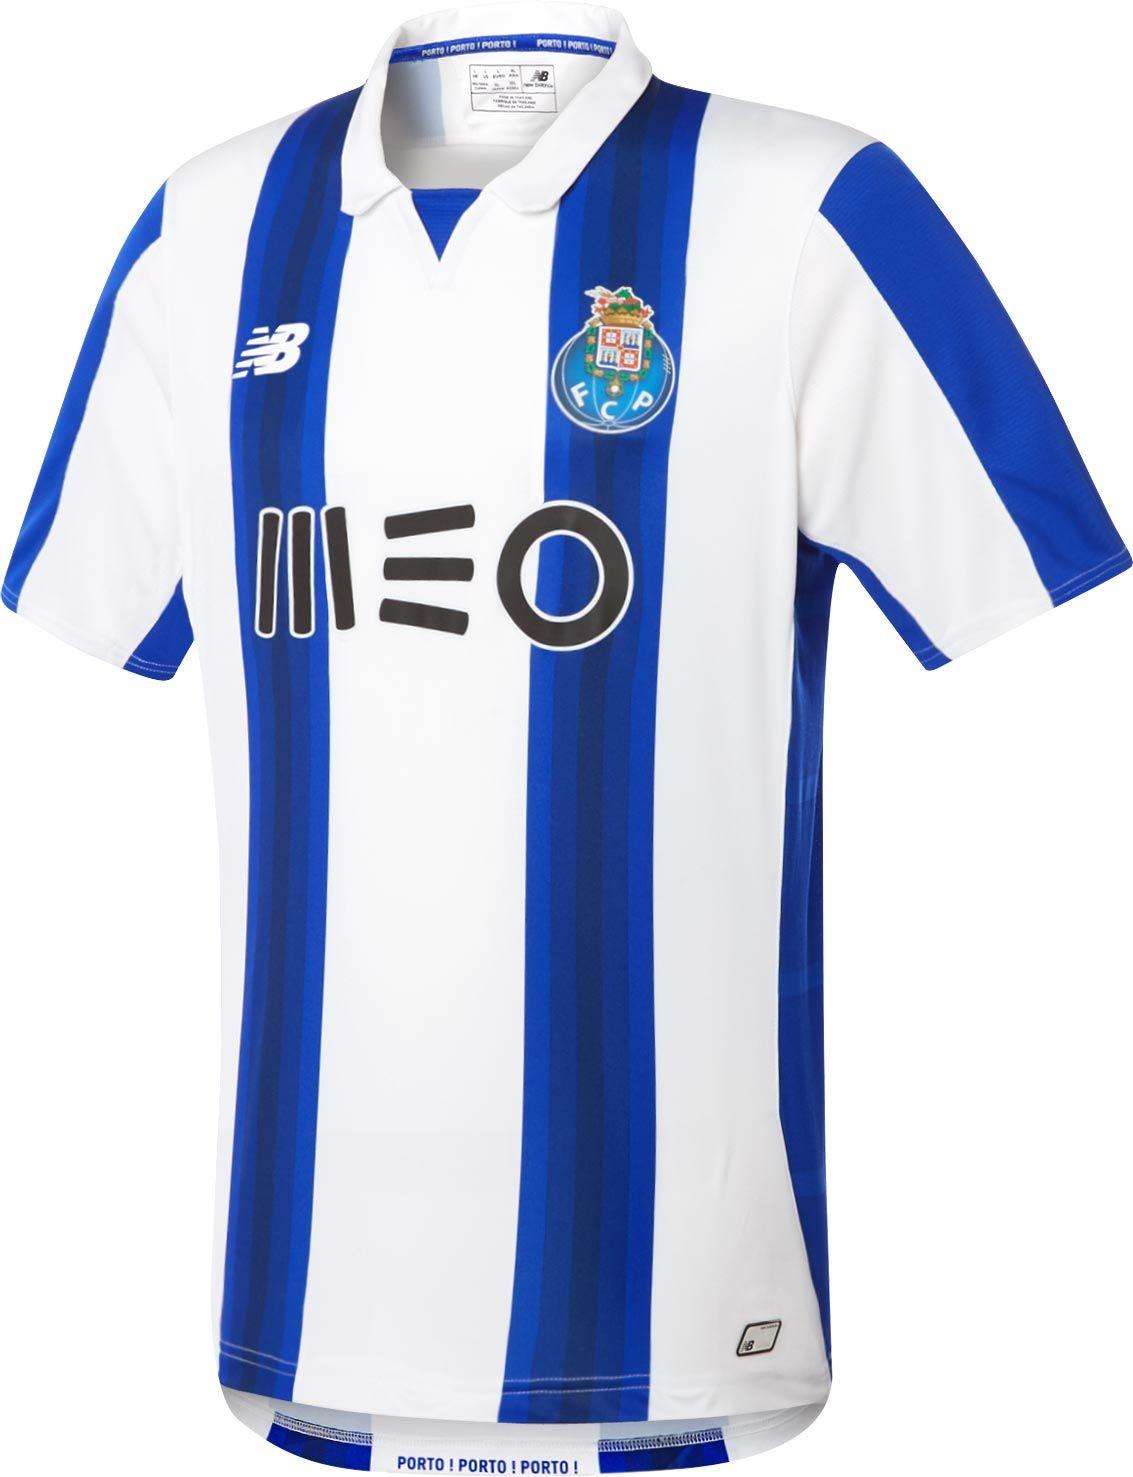 Porto 16-17 Home Kit Released - Footy Headlines  1a16475ec